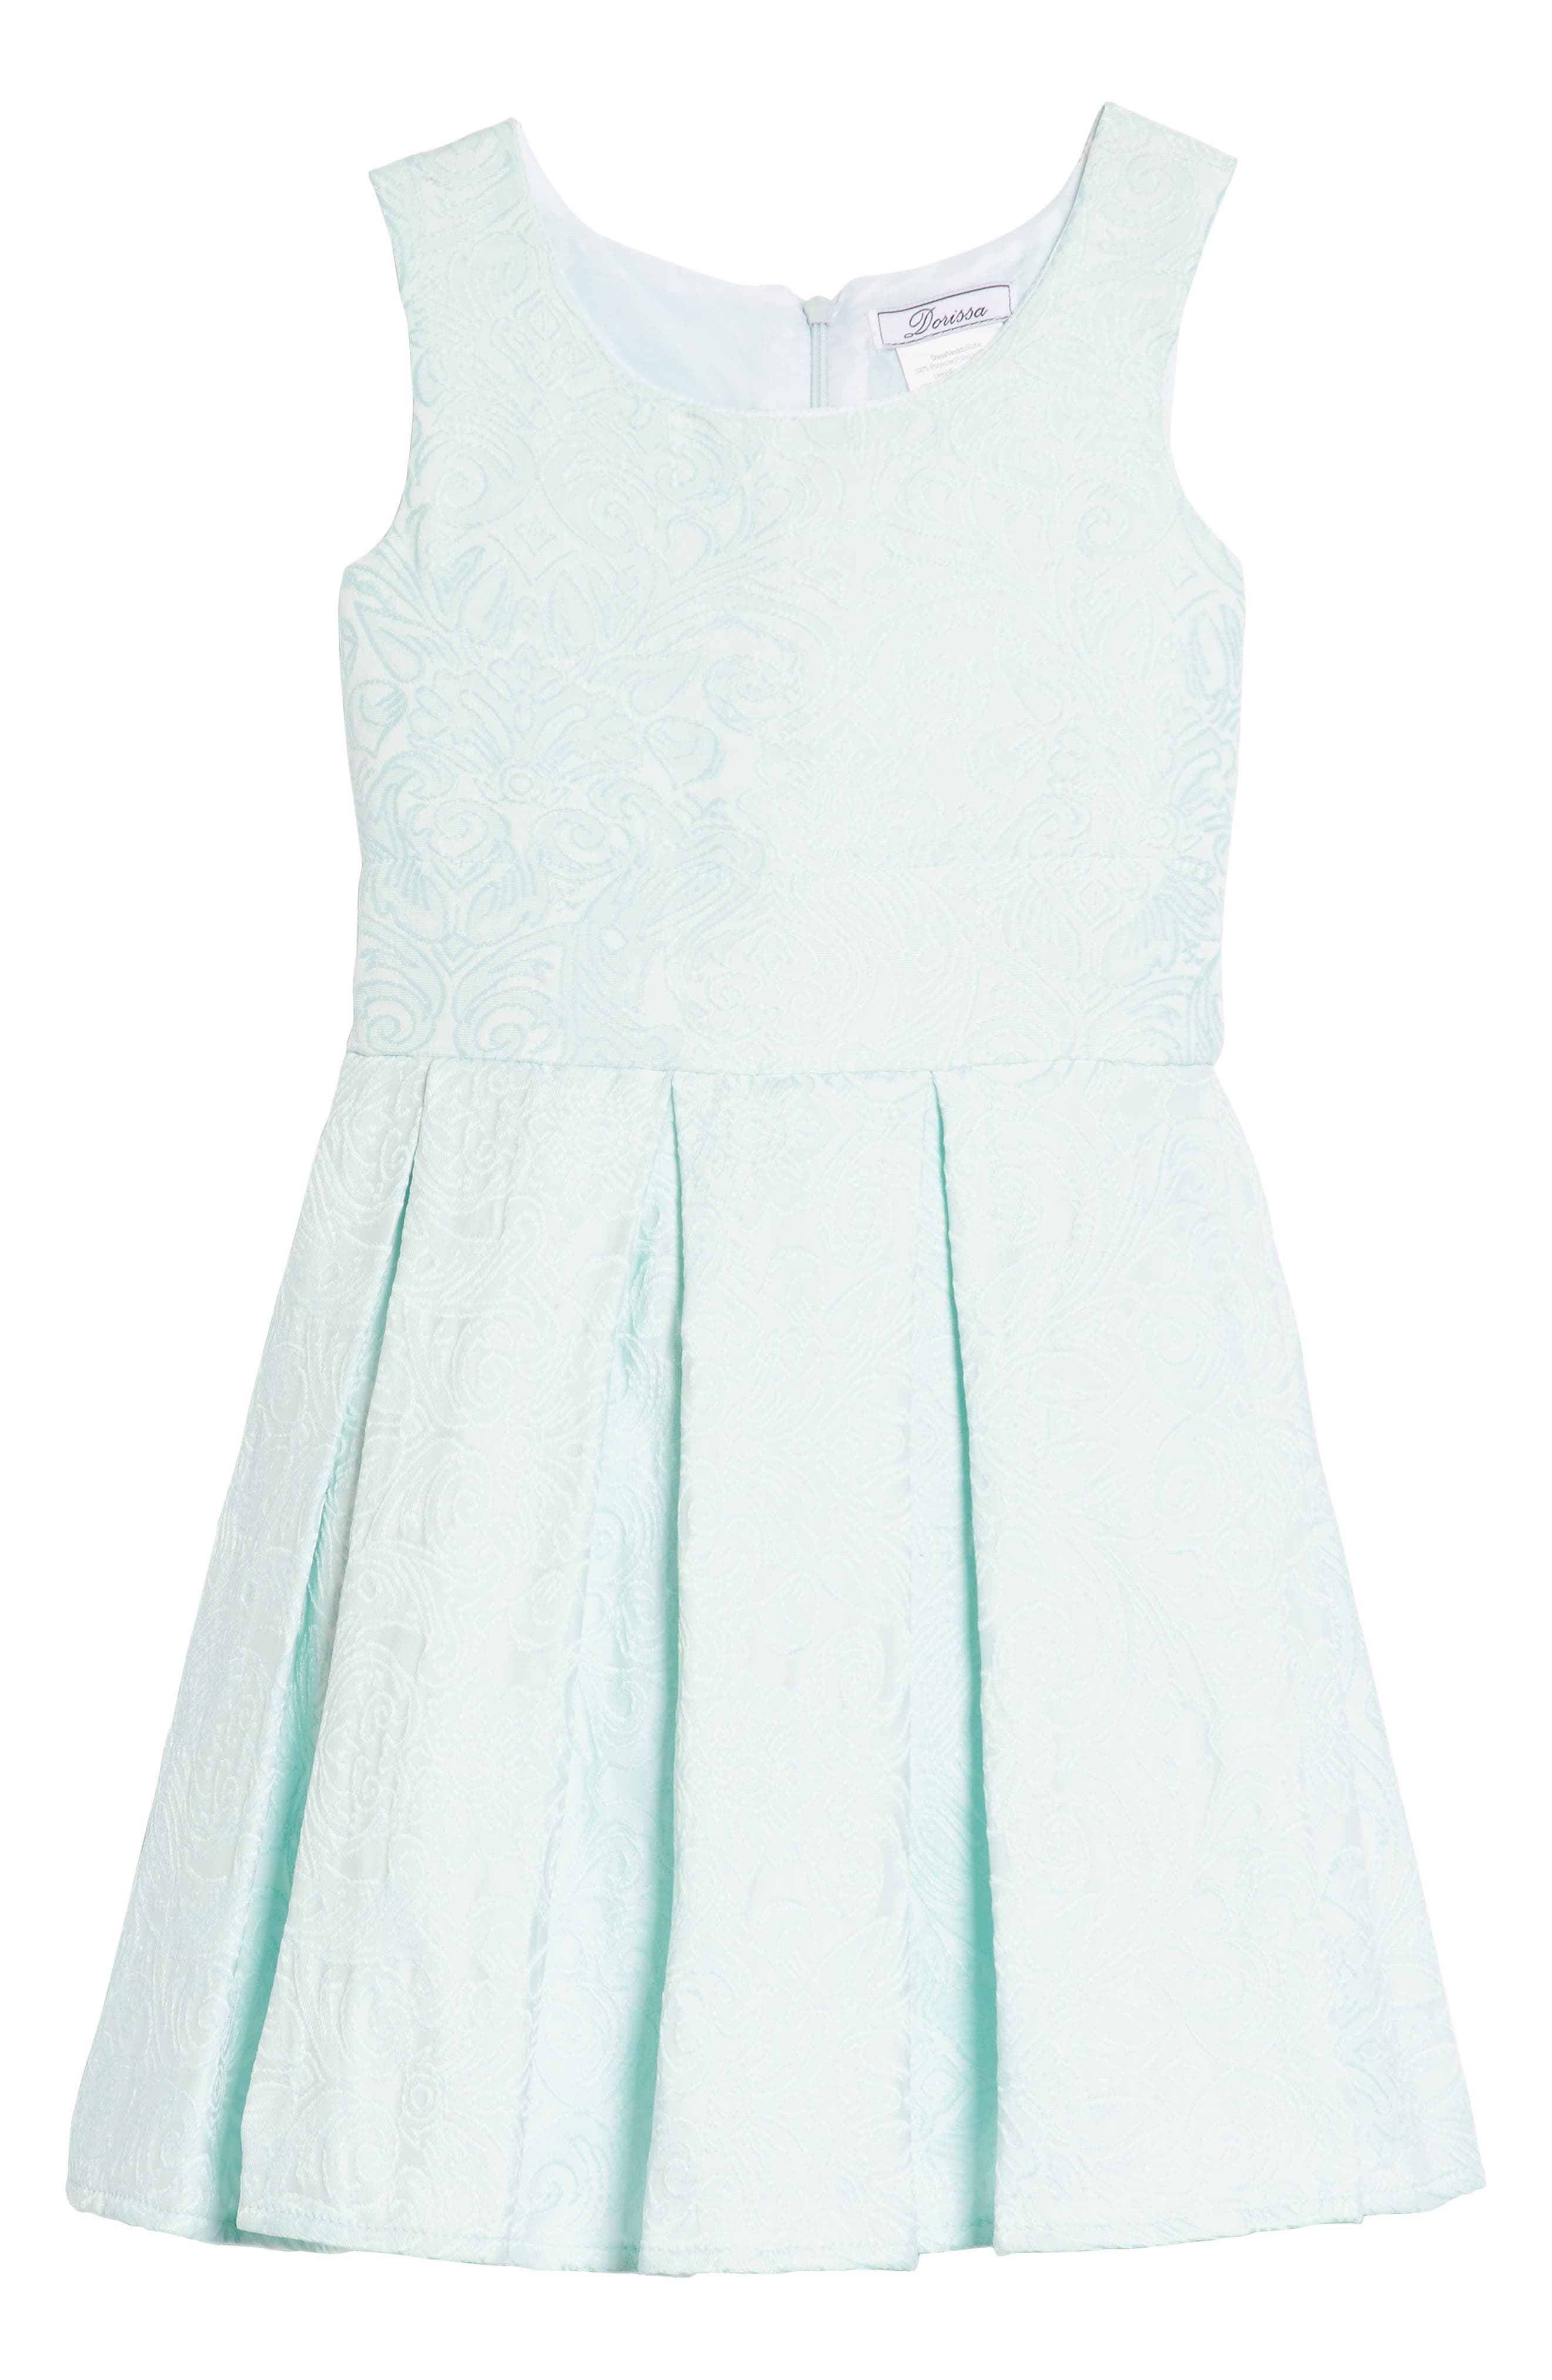 Megan Jacquard Dress,                         Main,                         color,